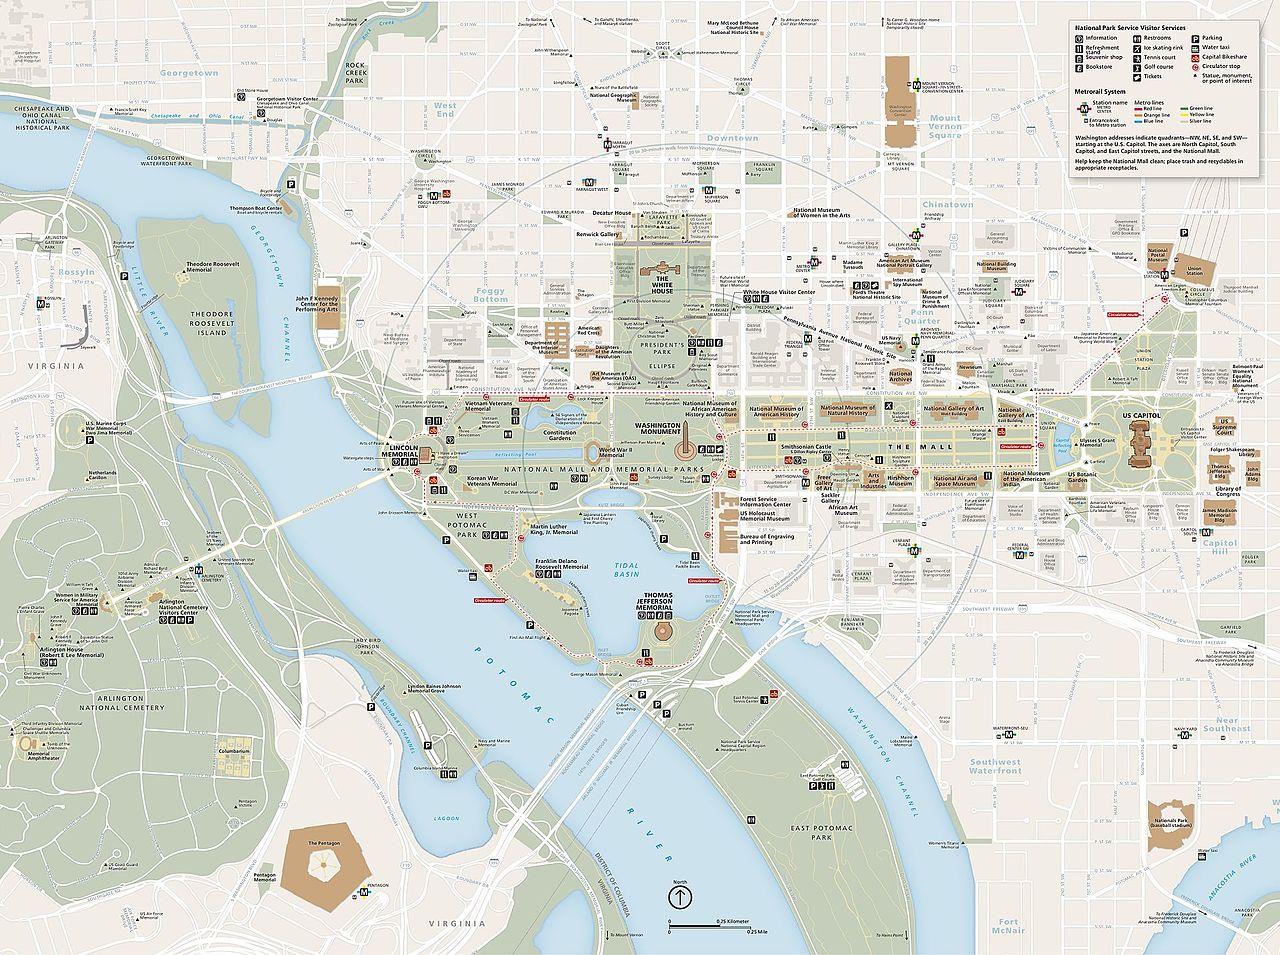 FileNPS Nationalmallmapjpg Wikimedia Commons - Us Capital Map Of The Mall